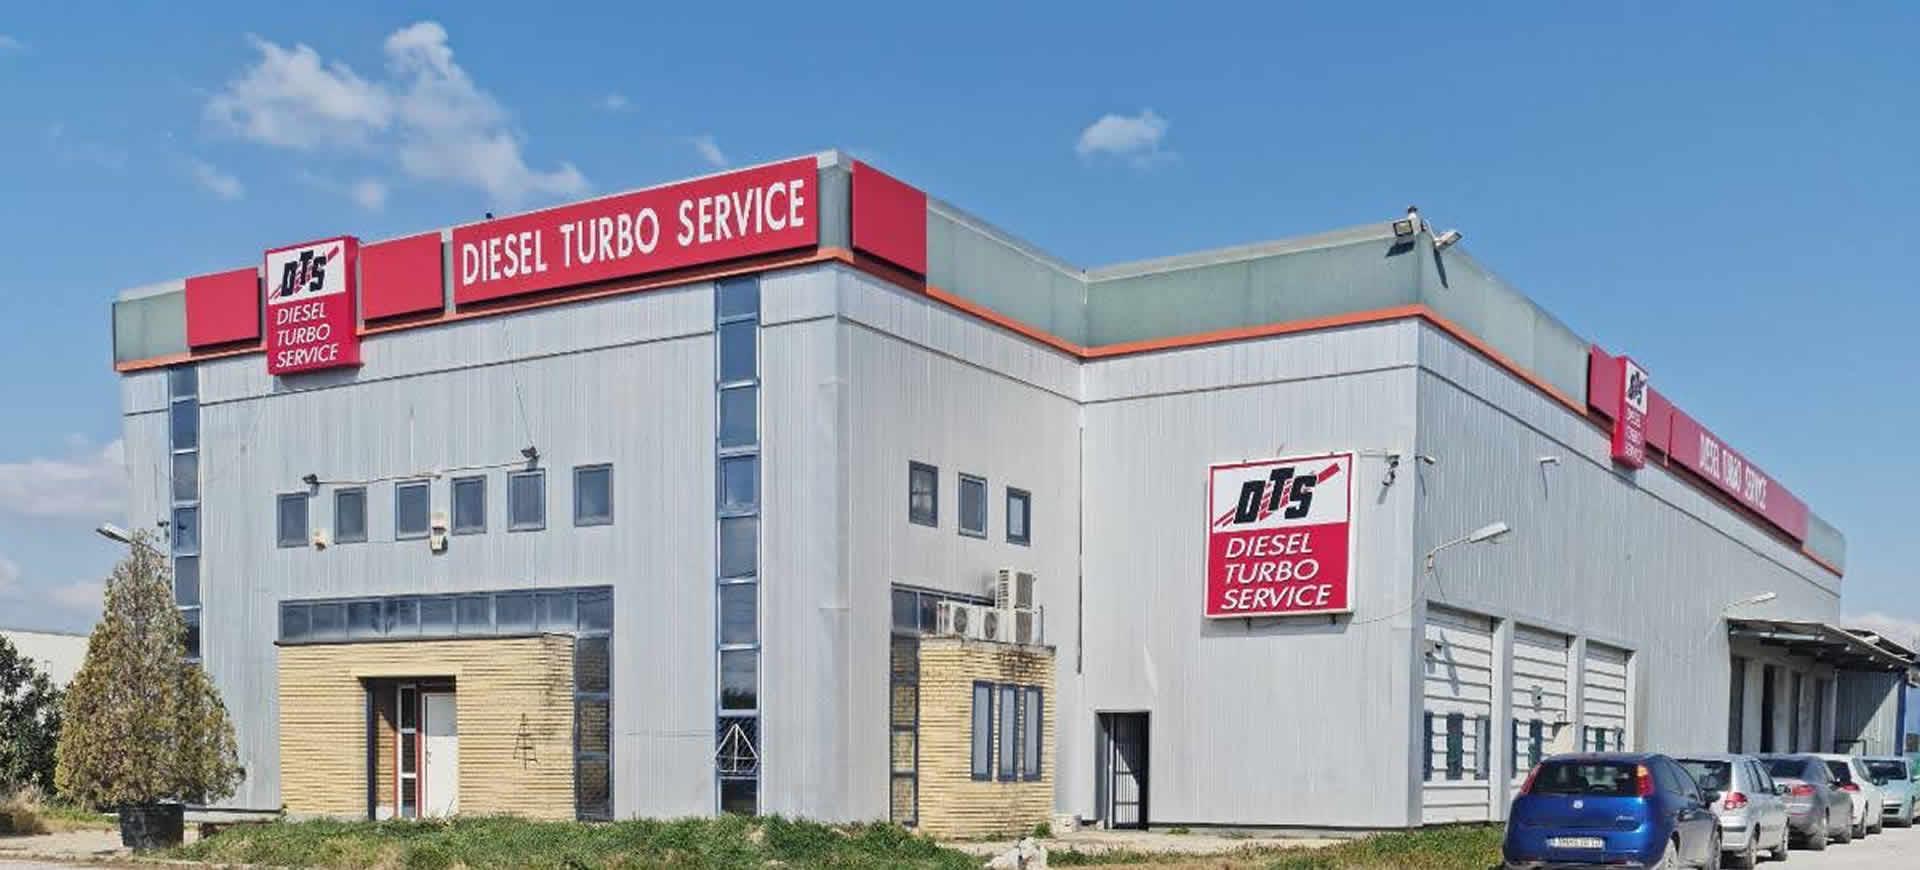 Services Επισκευή καθαρισμός τουρμπίνας, turbo, Μπέκ, Αντλία, πετρελαίου.